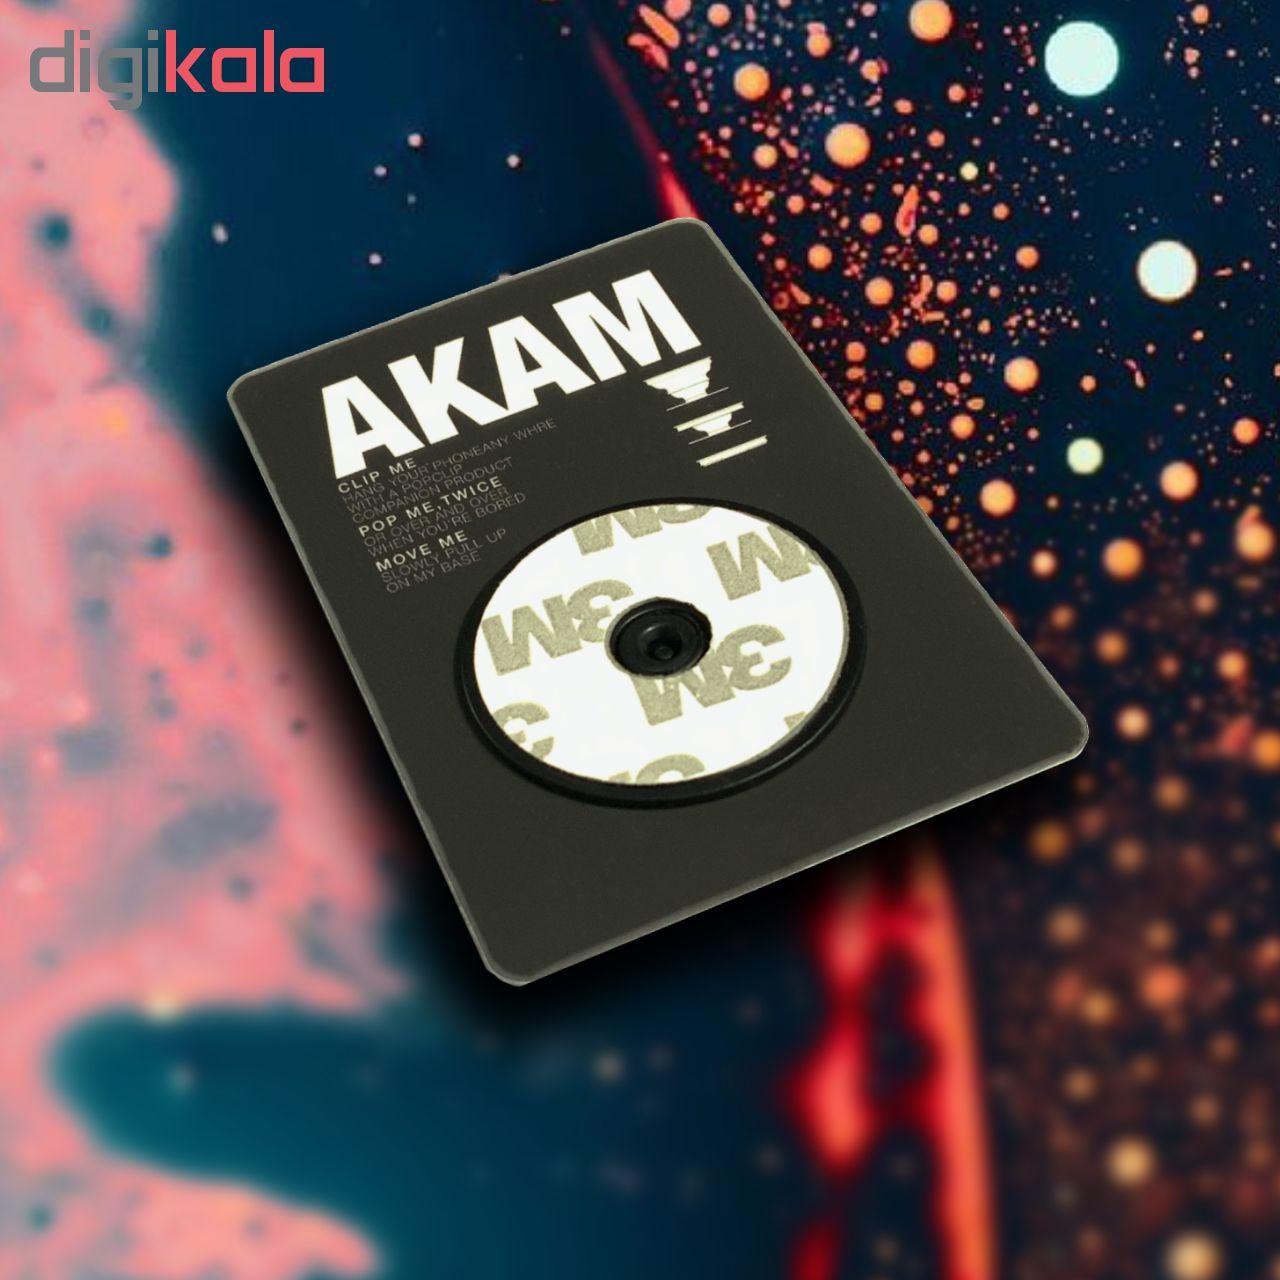 پایه نگهدارنده گوشی موبایل پاپ سوکت آکام مدل APS0078 main 1 2